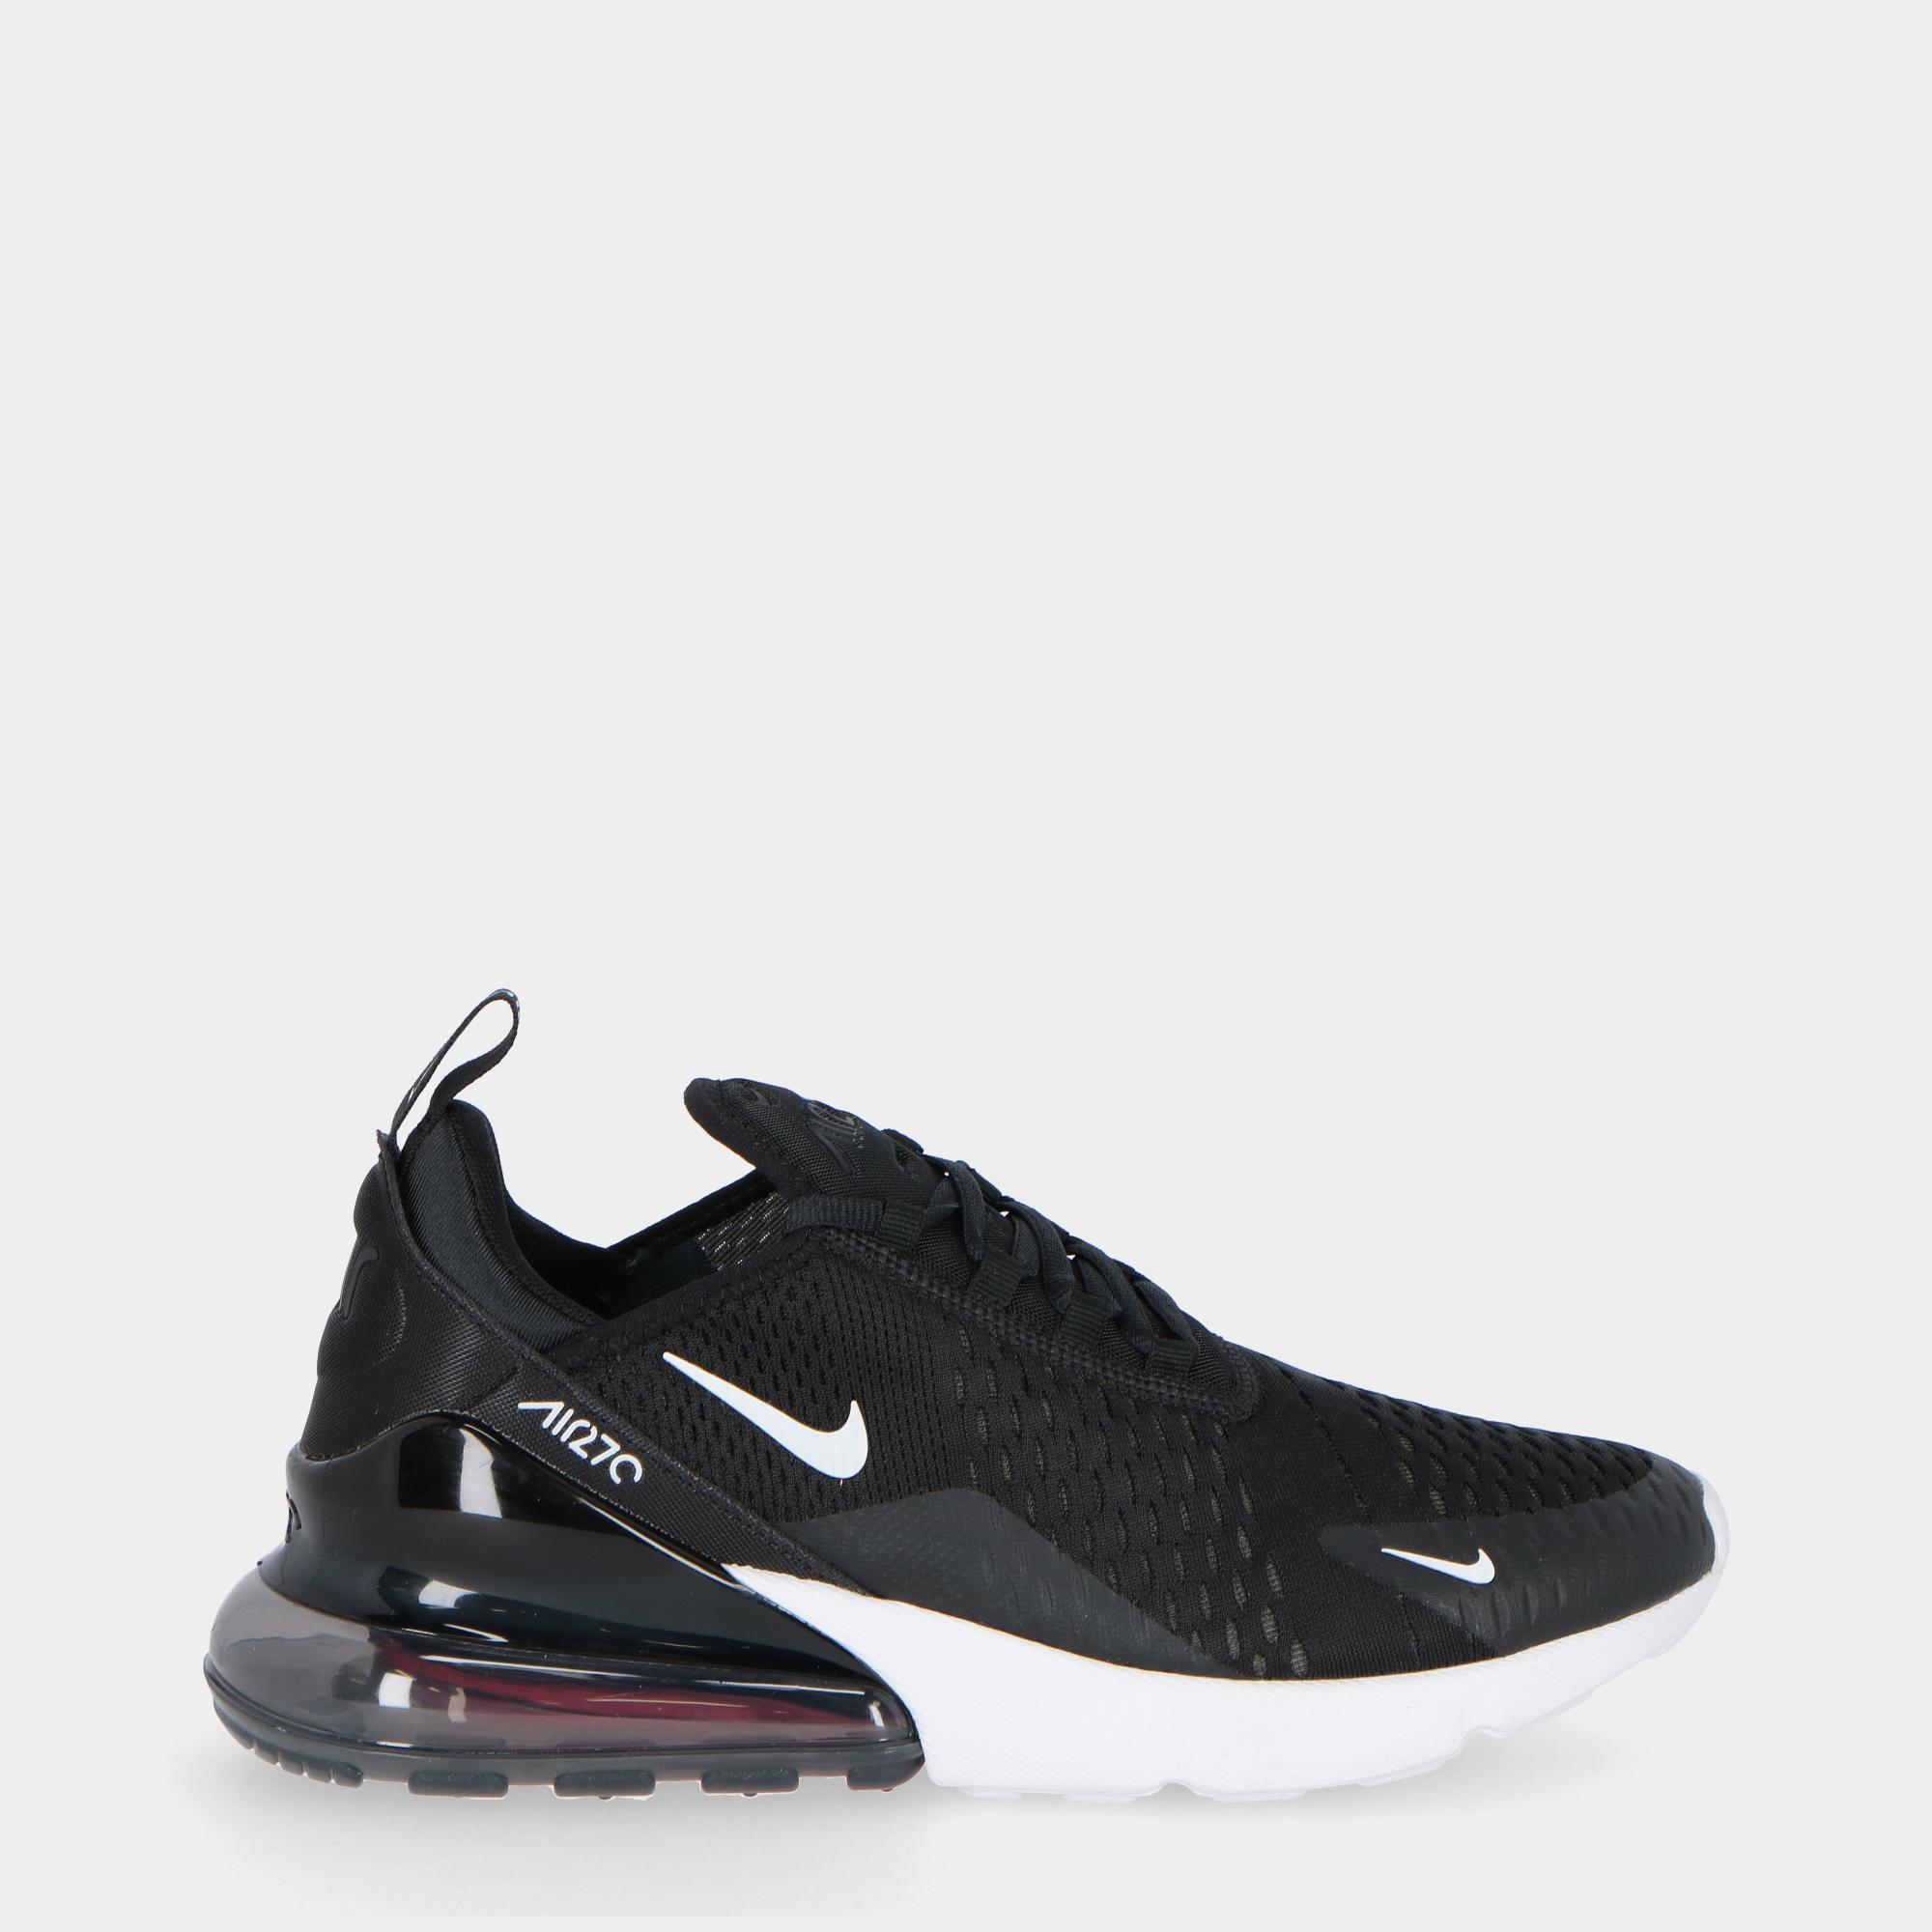 innovative design 0bf4d 484f7 Nike Air Max 270 Black